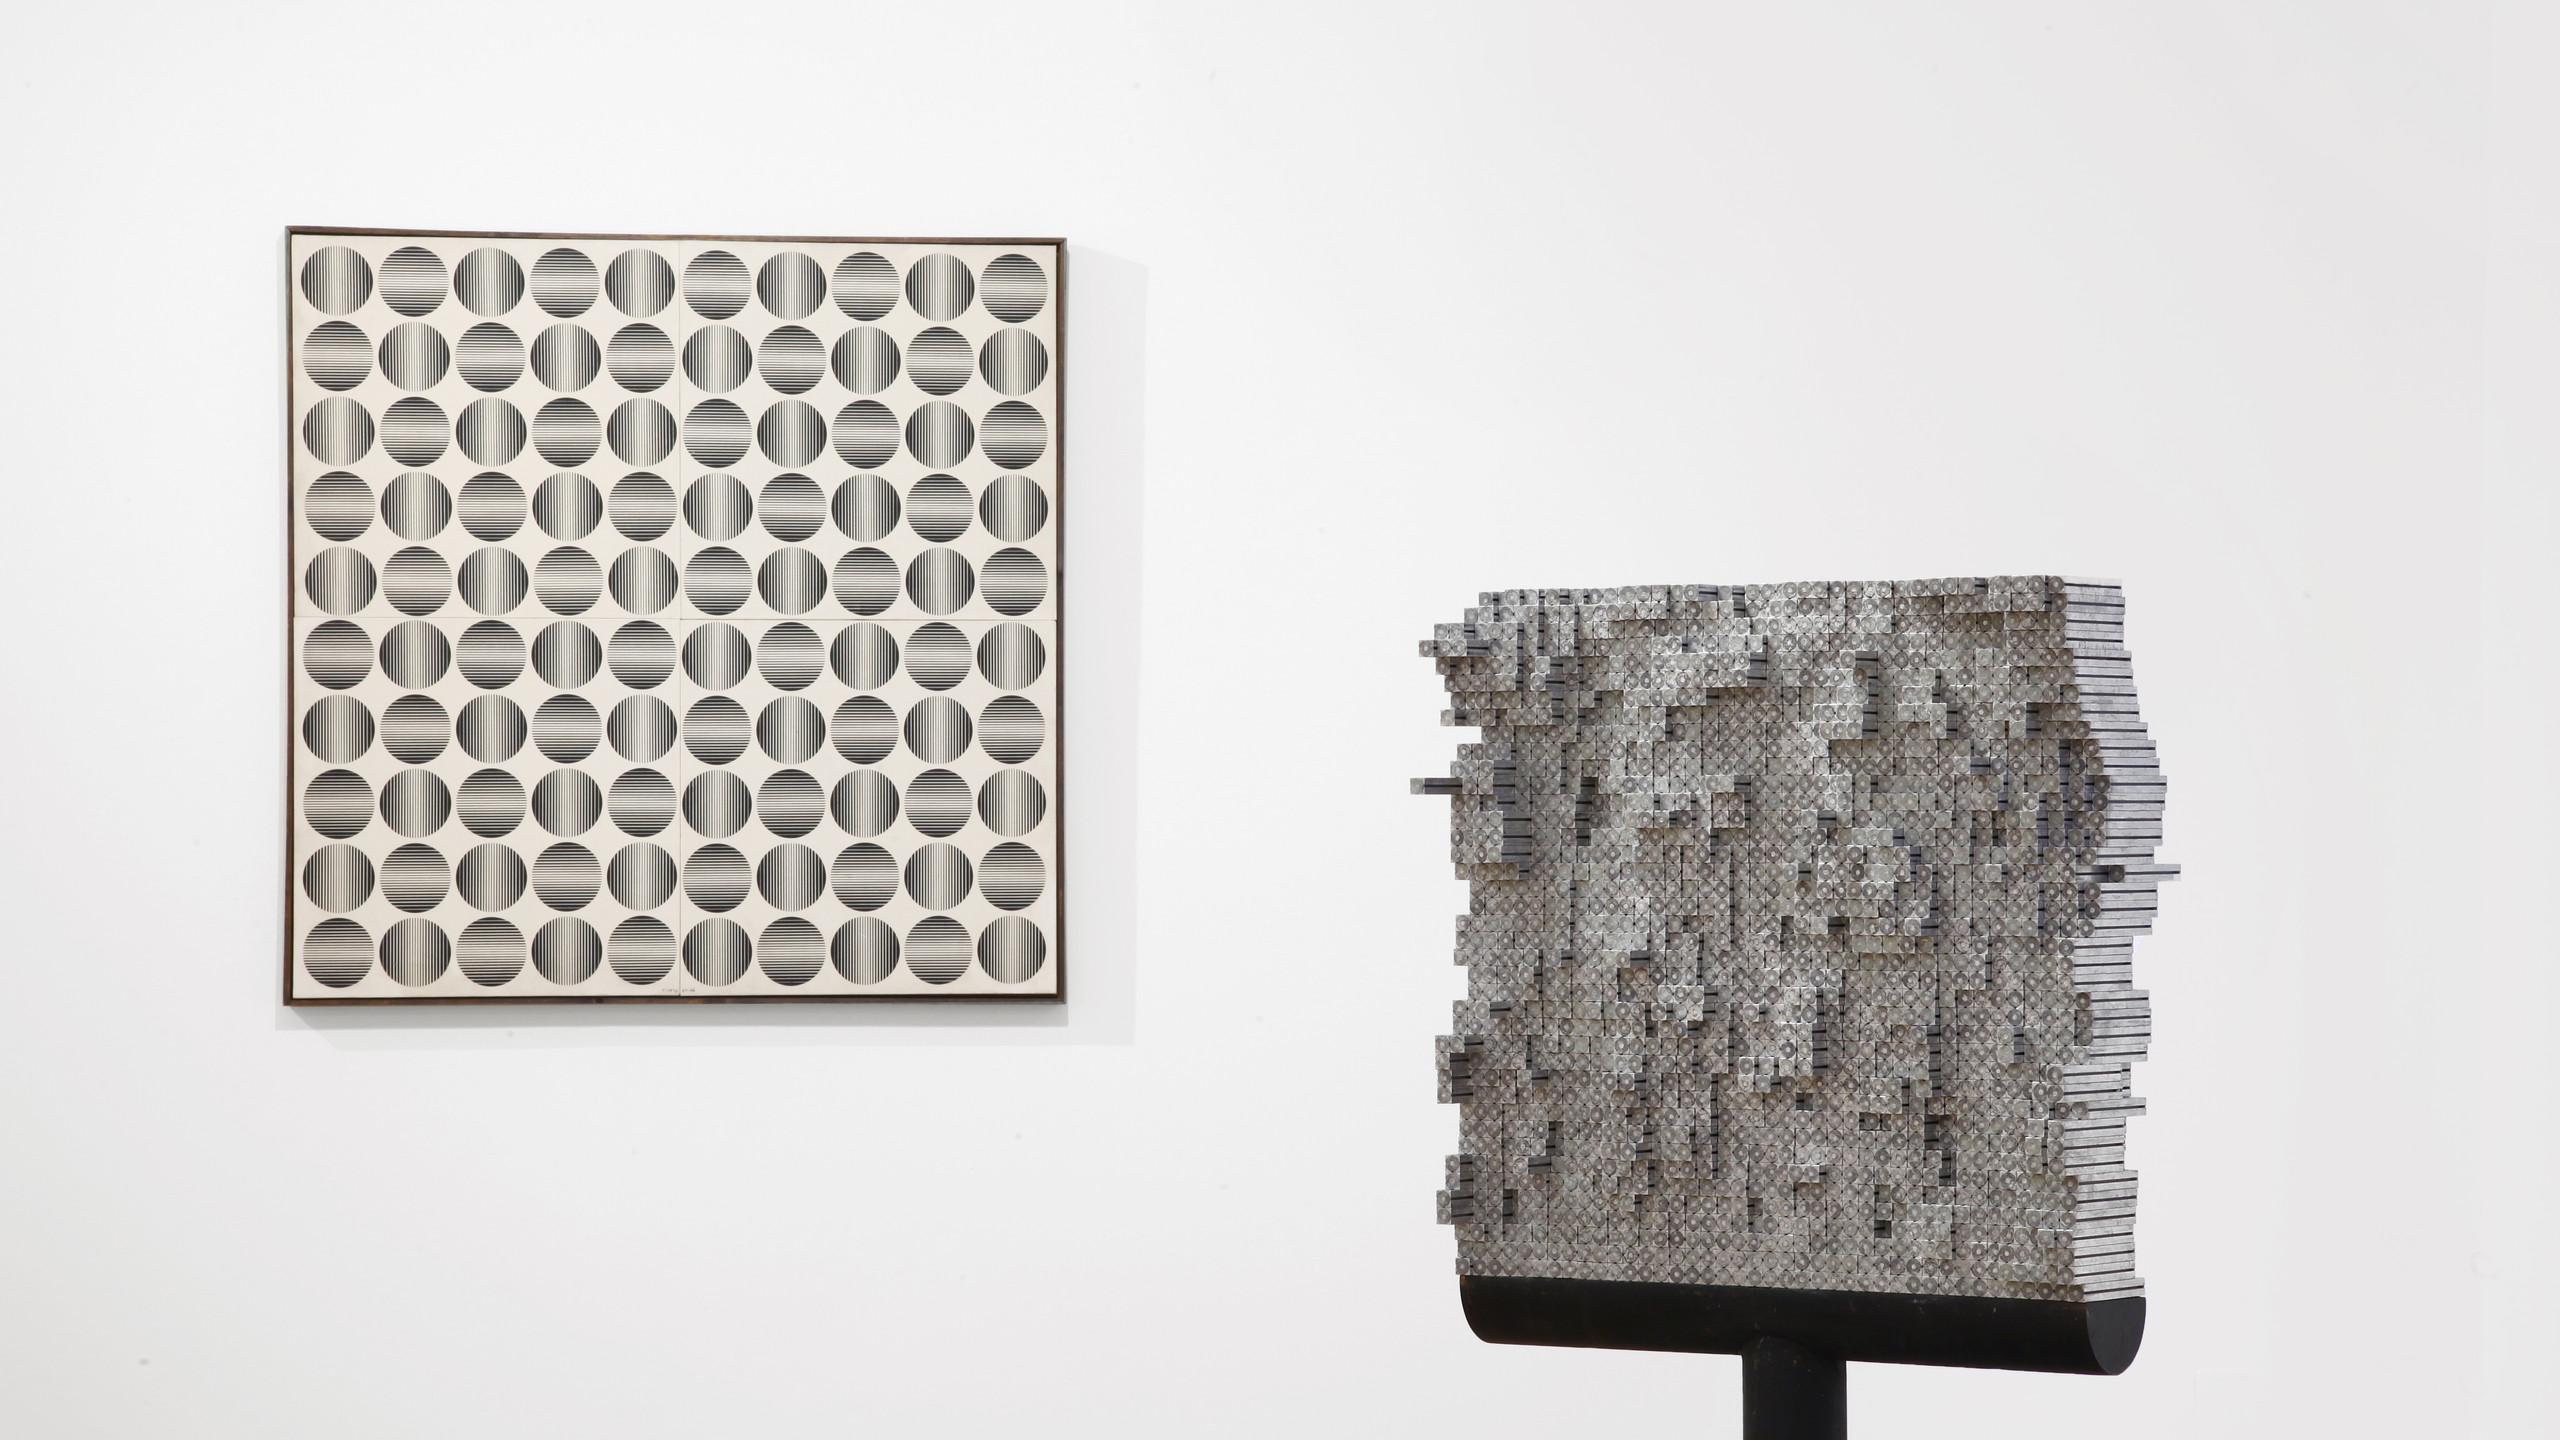 Exhibition views Zagreb Calling. Ivan Picelj, Vjenceslav Richter and Julije Knifer. Cortesi Gallery, Milano. Photo by Bruno Bani. Courtesy of Cortesi Gallery.